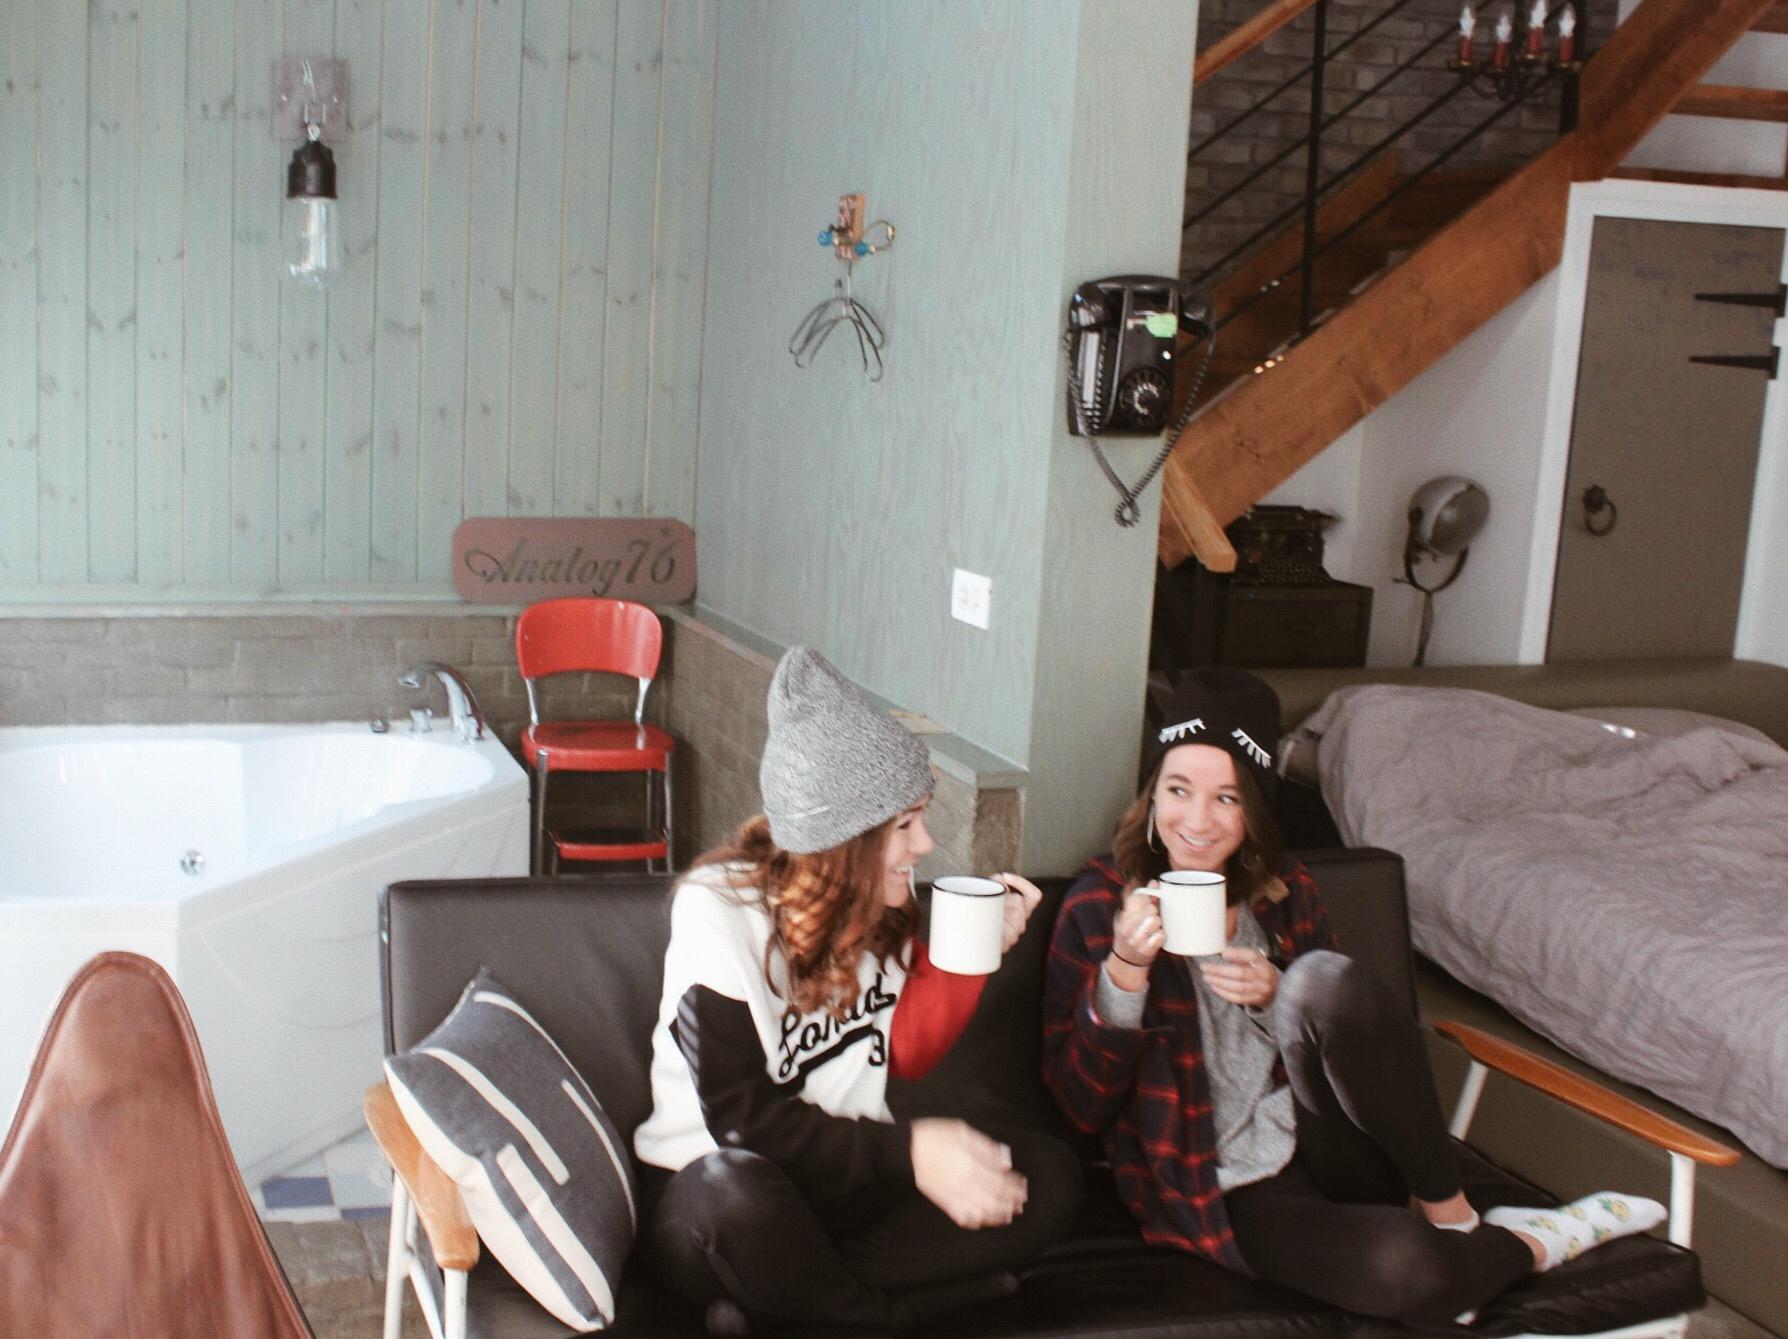 Analog 76 Gangneung, South Korea | HallAroundtheWorld